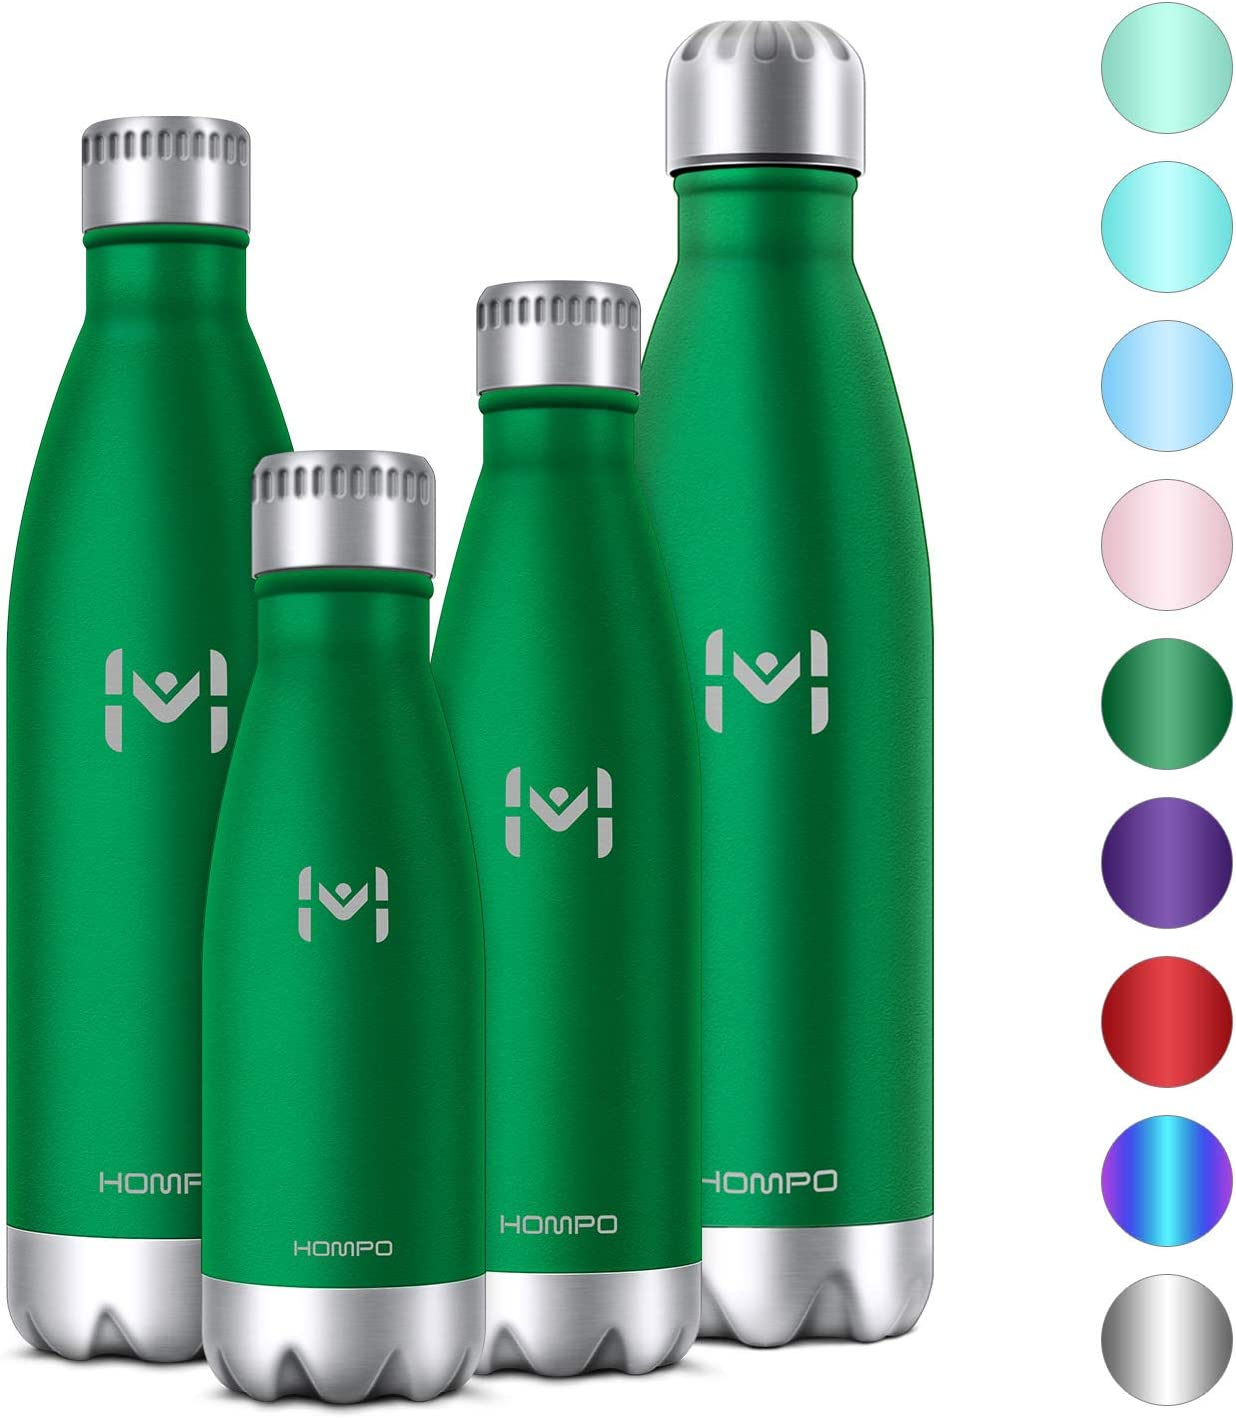 HOMPO BotelladeAguadeAceroInoxidable BotellaTermica500ml, BotellaSinBpa&EcoFriendly, Mantiene Bebidas frías por 24h y Calientes por 12h, AdecuadaparaViaje, Deporte, Bicicleta, Gimnas